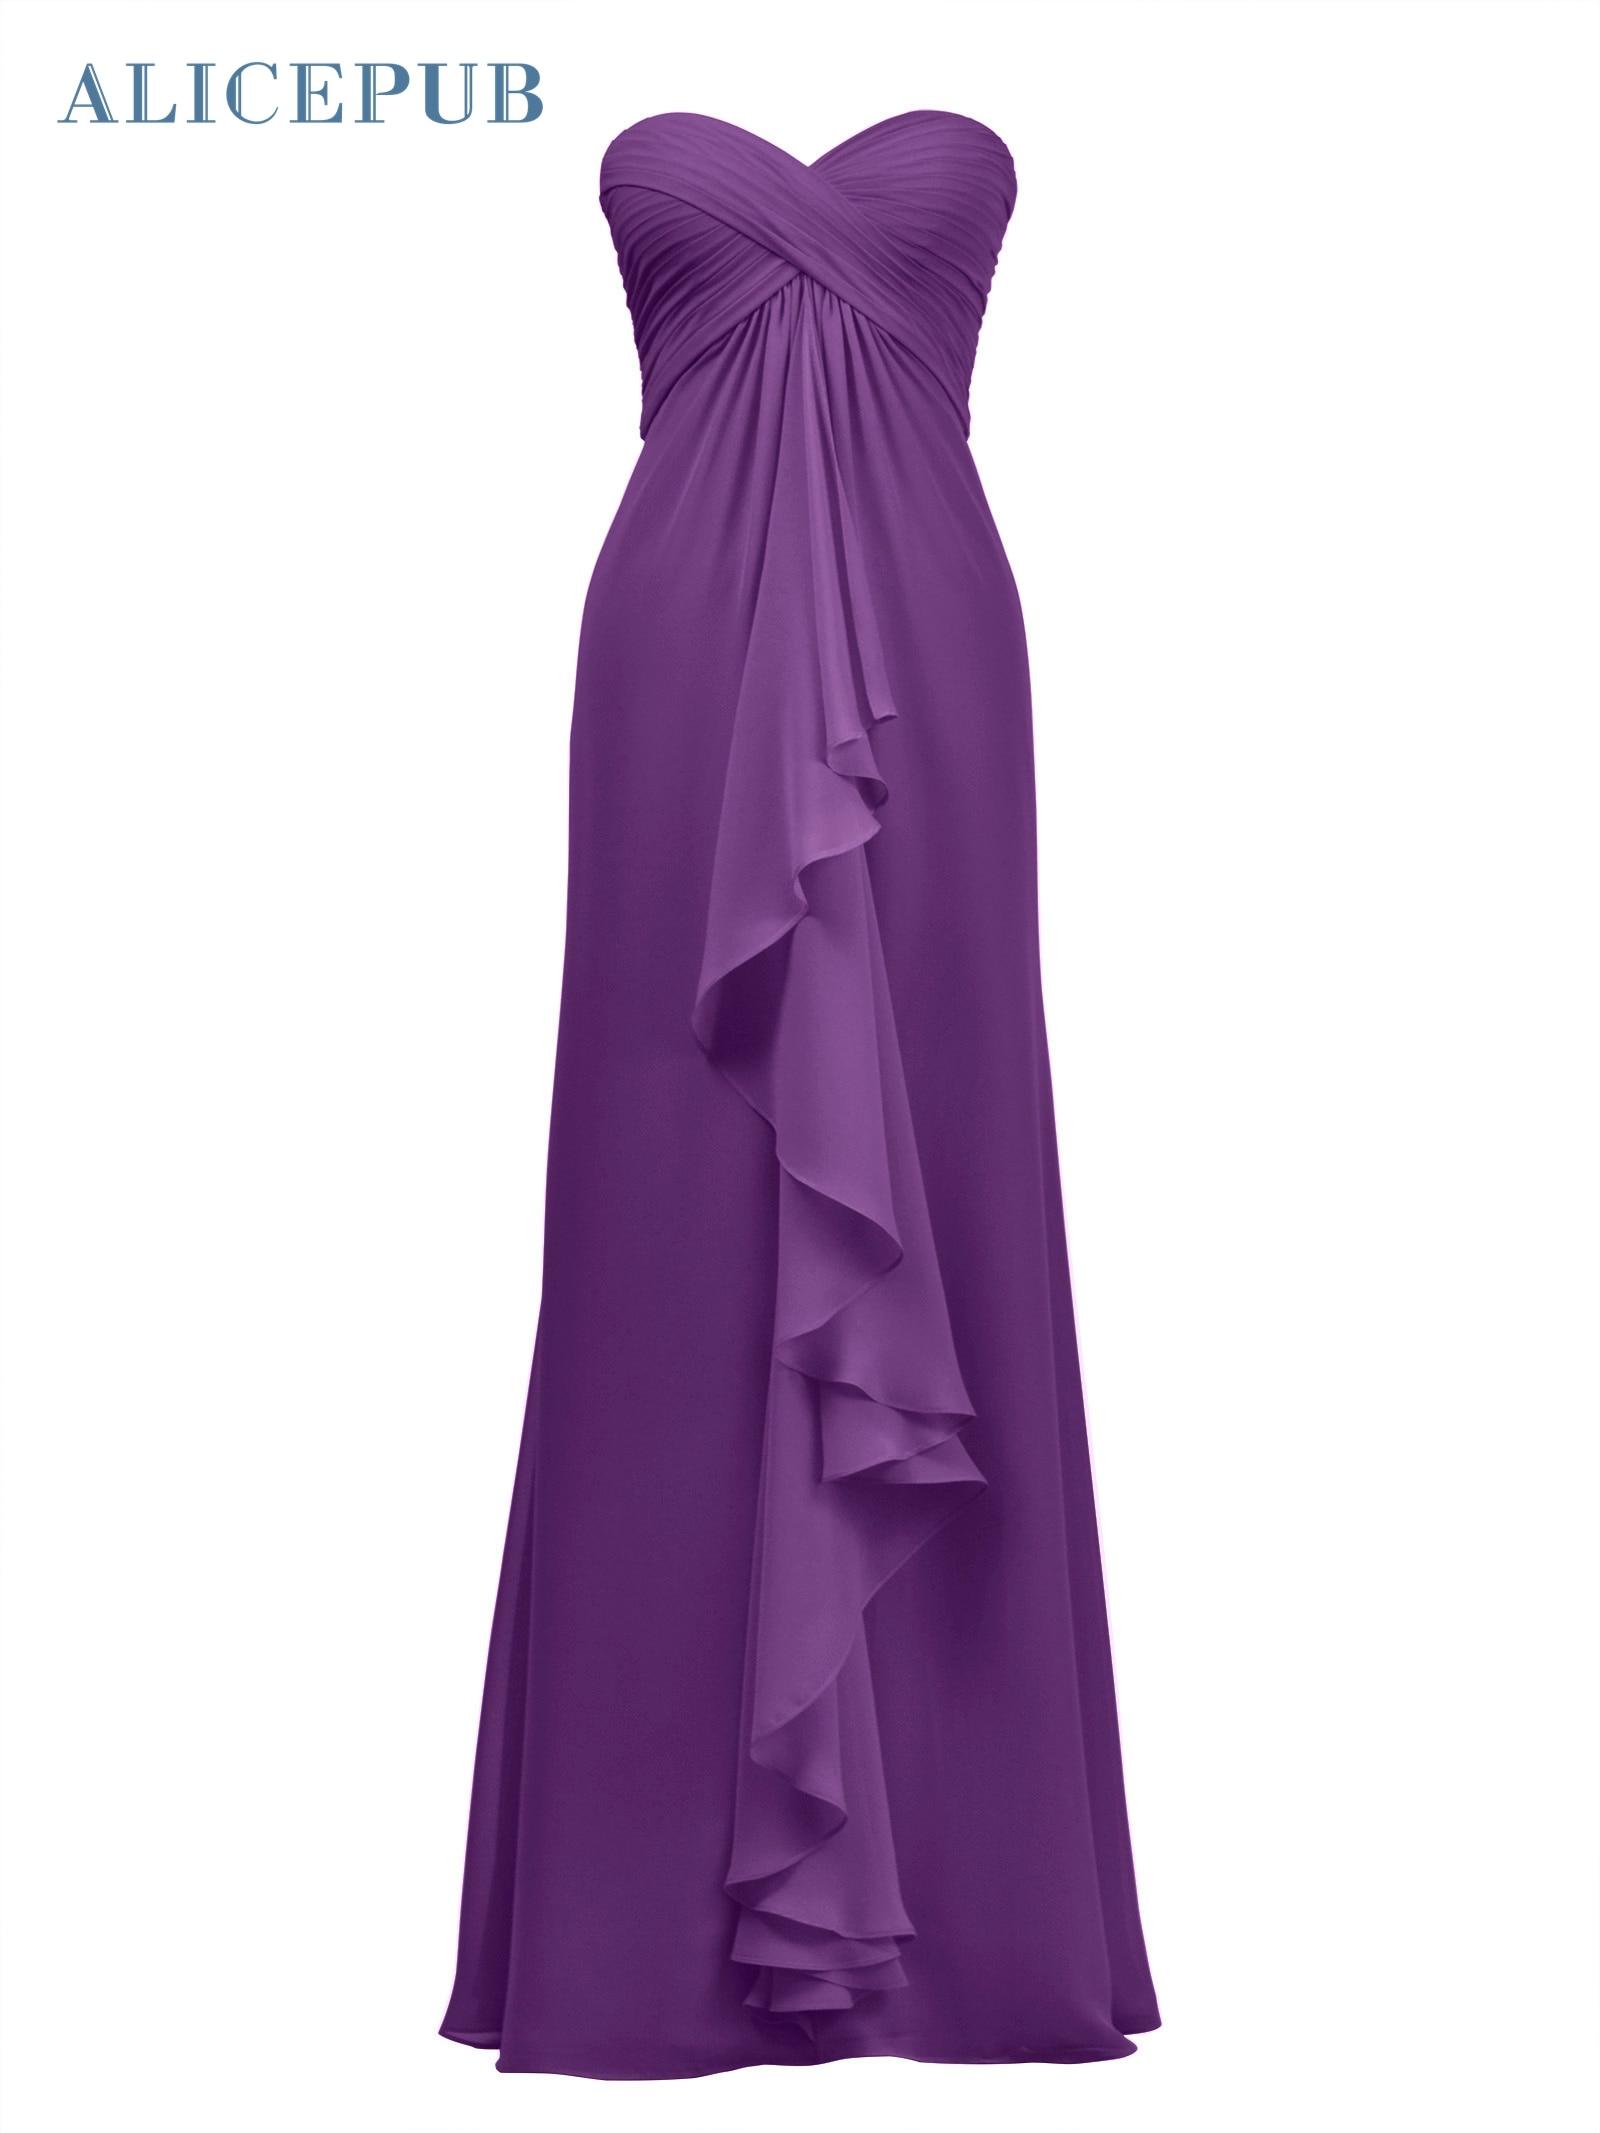 Alicepub Chiffon Bridesmaid Dresses Long Formal Dresses Prom Evening Gown